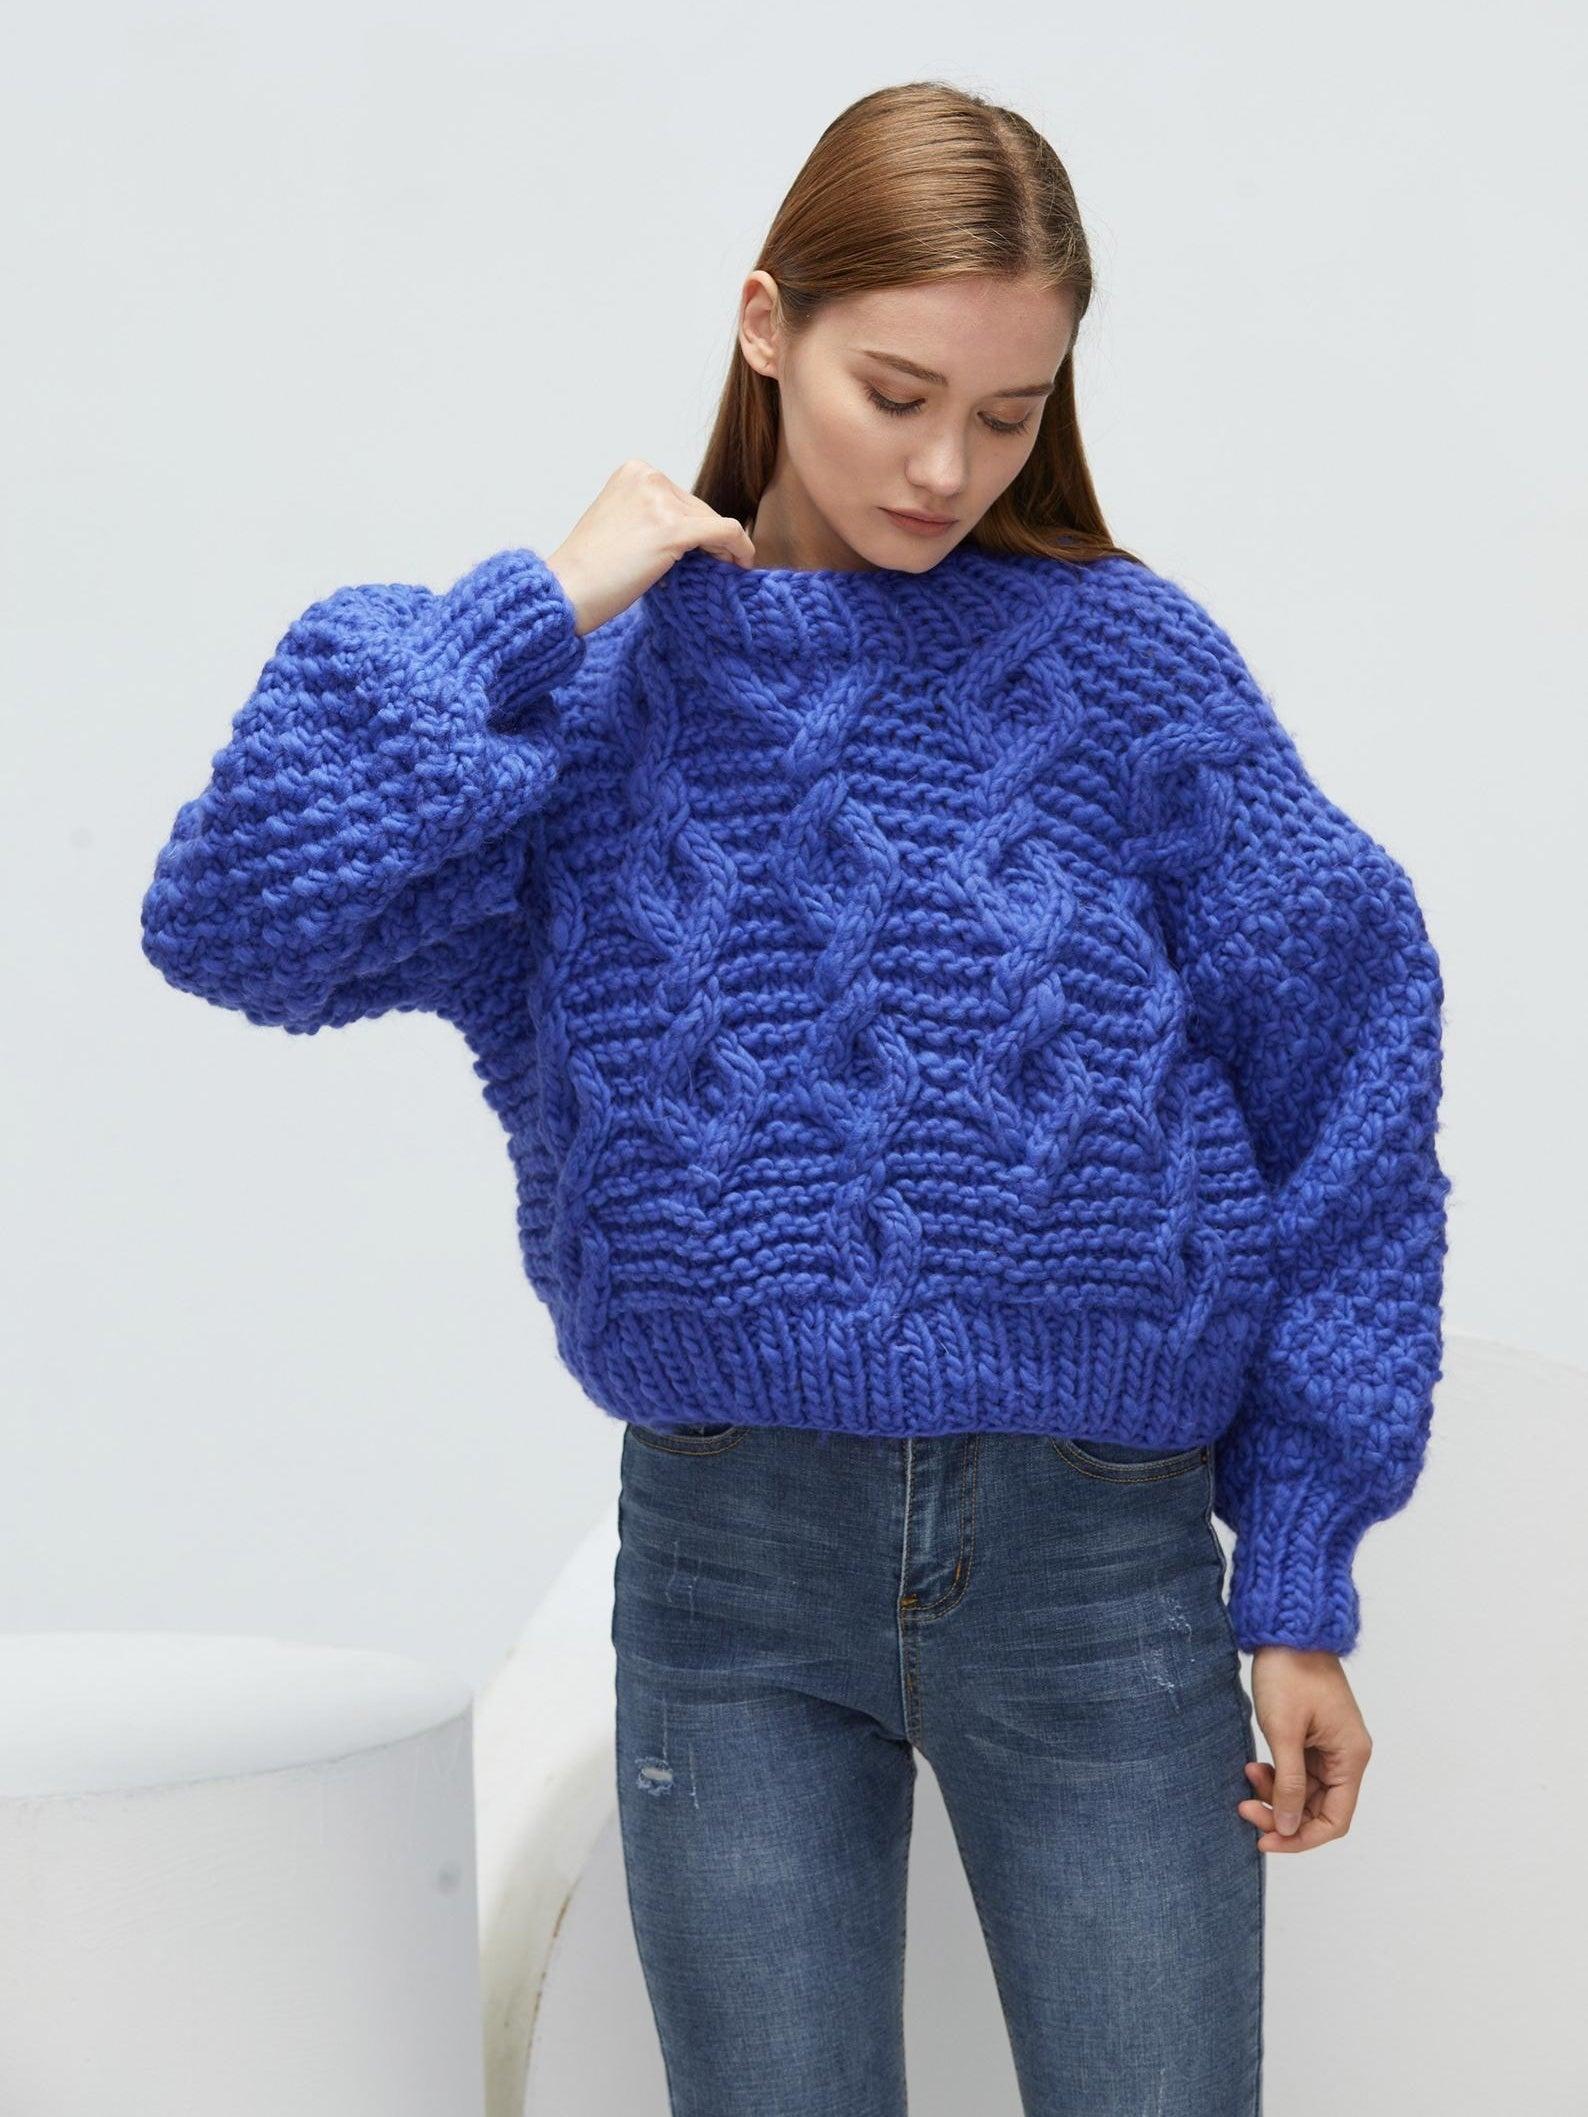 A model wearing the sweater in blue